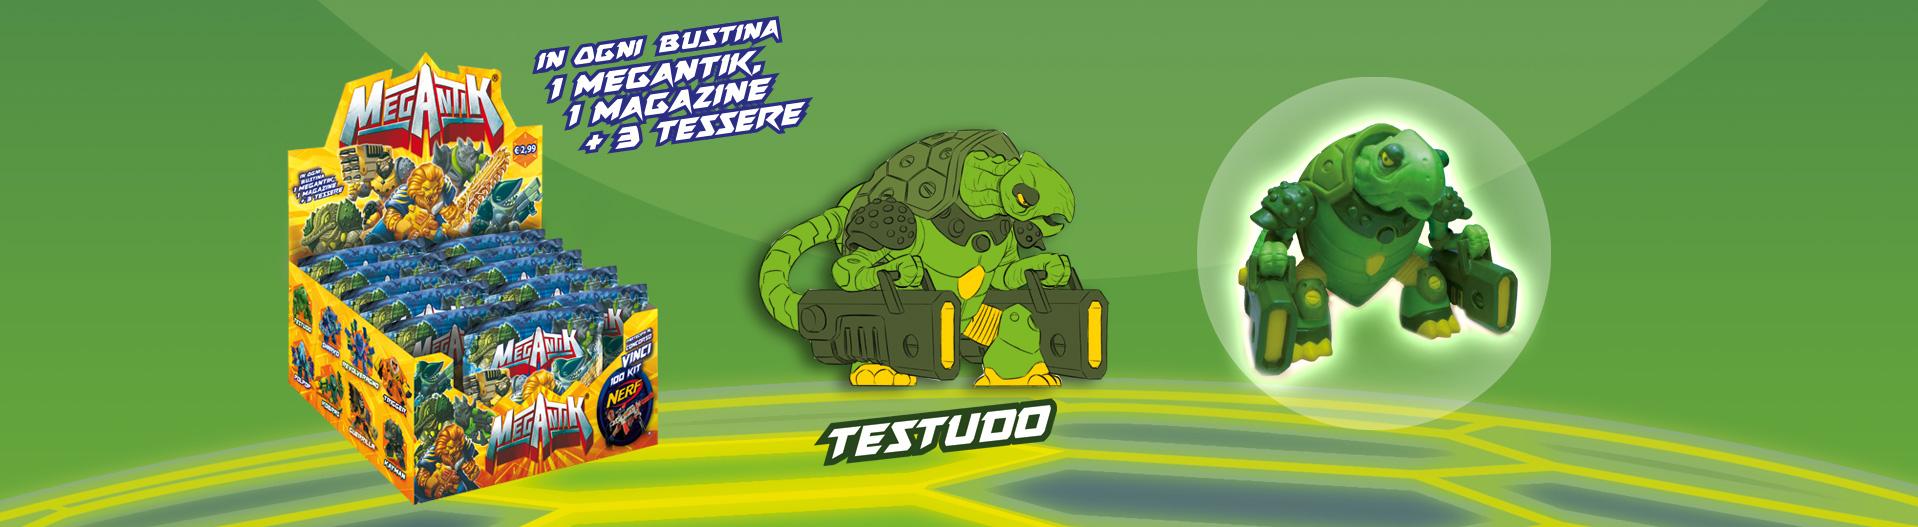 TESTUDO1